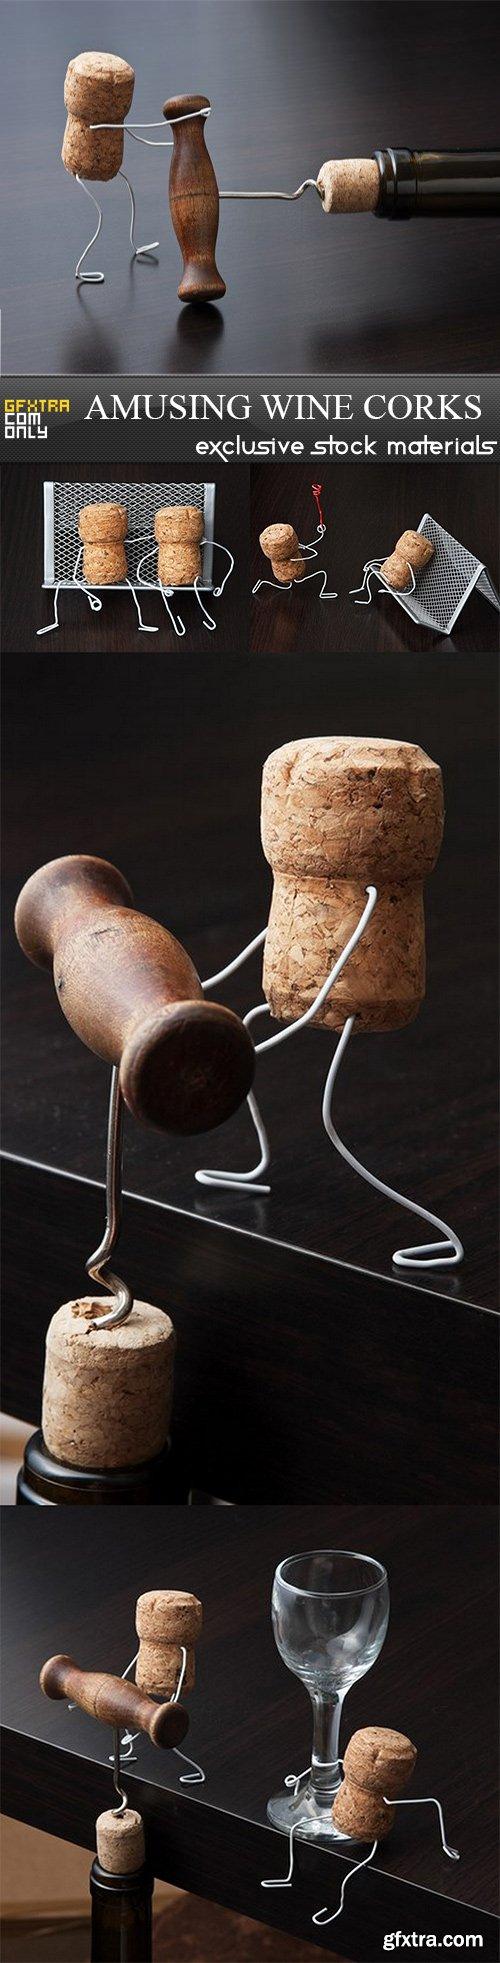 Amusing Wine Corks - 5 UHQ JPEG